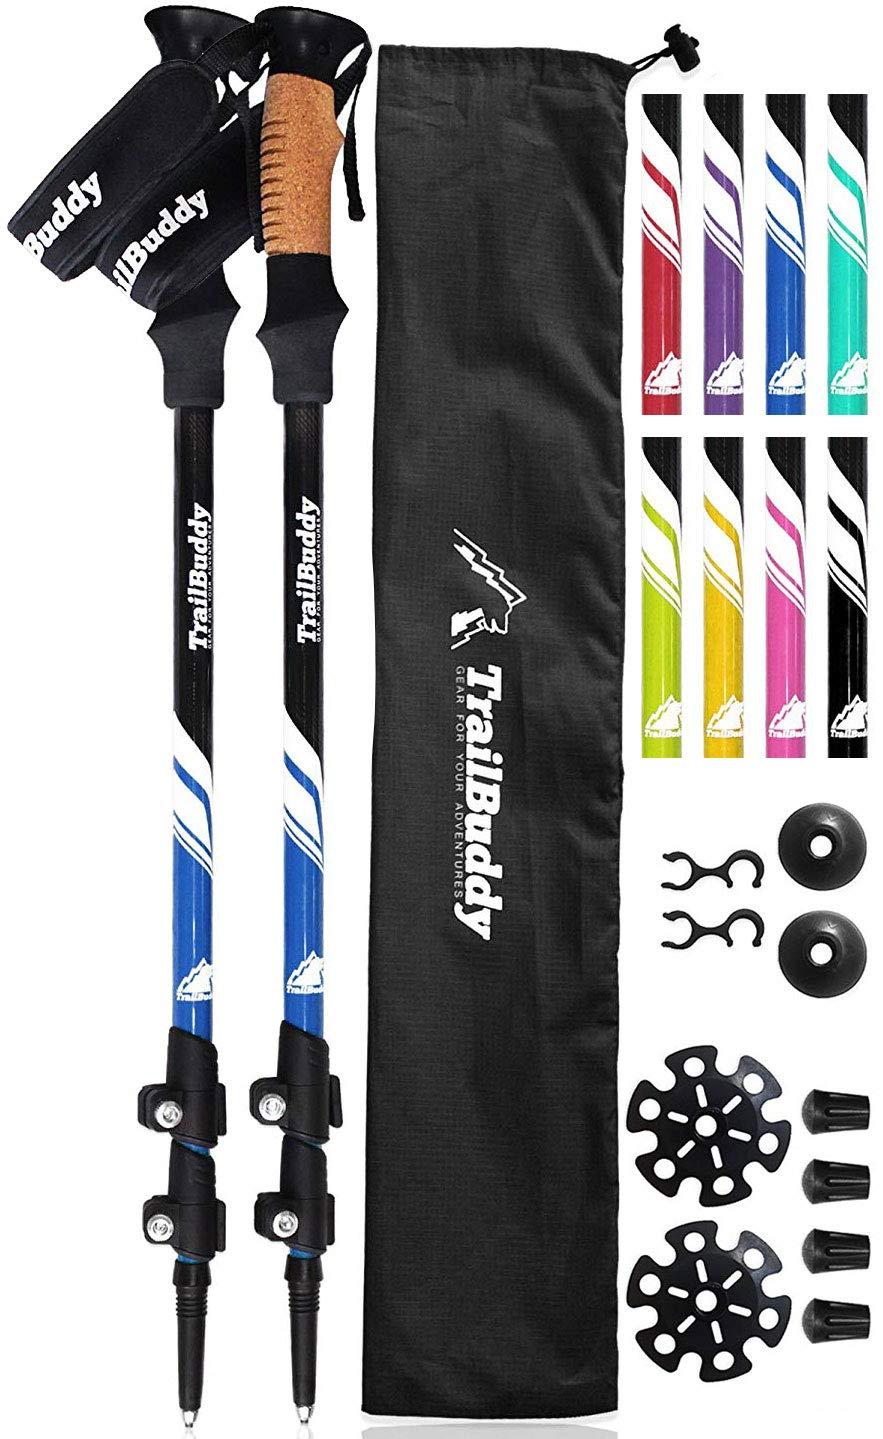 TrailBuddy Lightweight Trekking Poles - 2-pc Pack Adjustable Hiking or Walking Sticks - Strong Aircraft Aluminum - Quick Adjust Flip-Lock - Cork Grip, Padded Strap (Lake Blue) by TrailBuddy